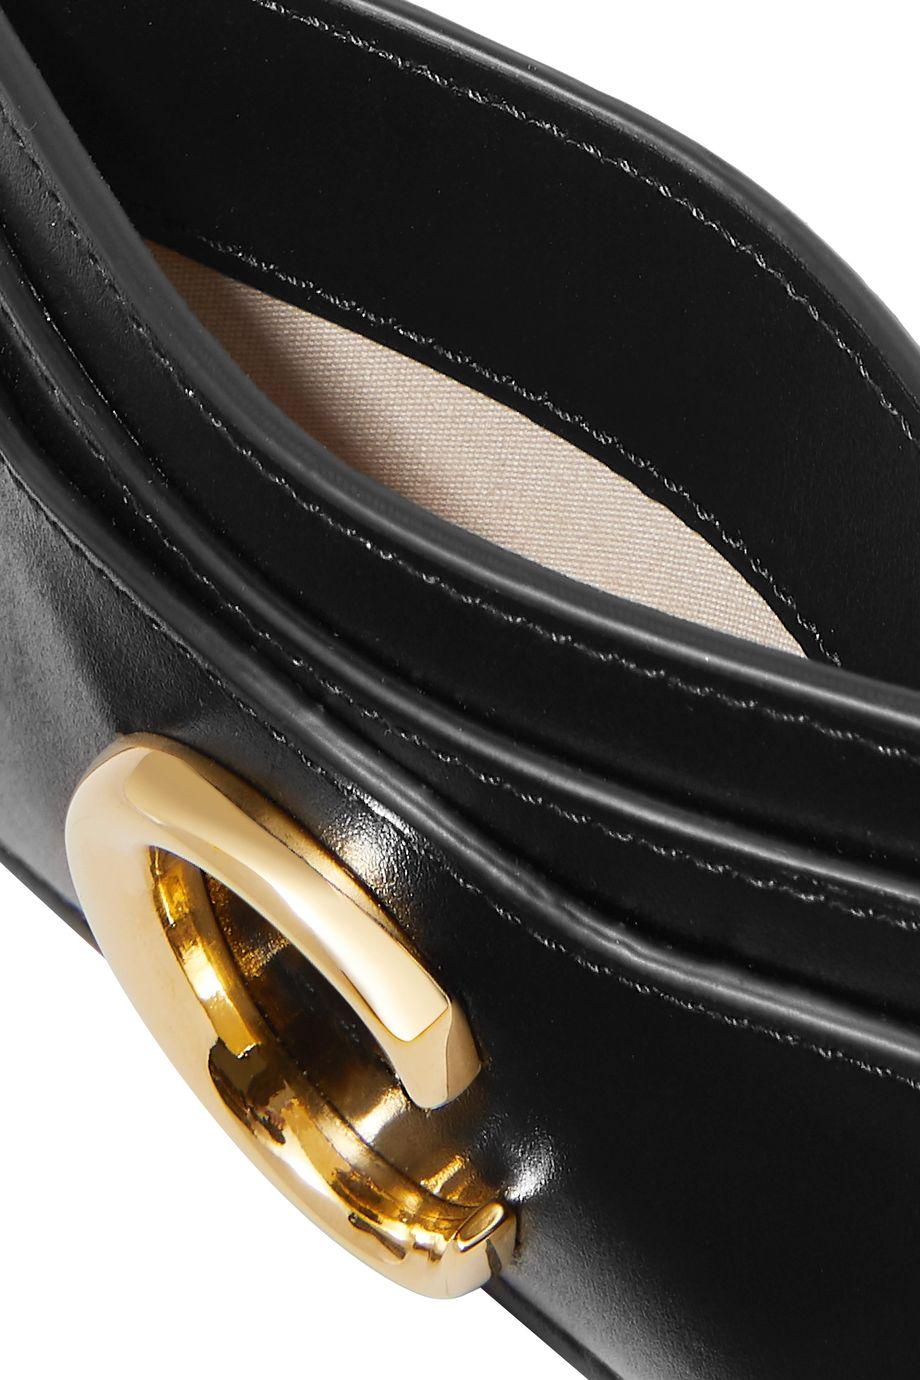 Chloé Chloé C leather cardholder